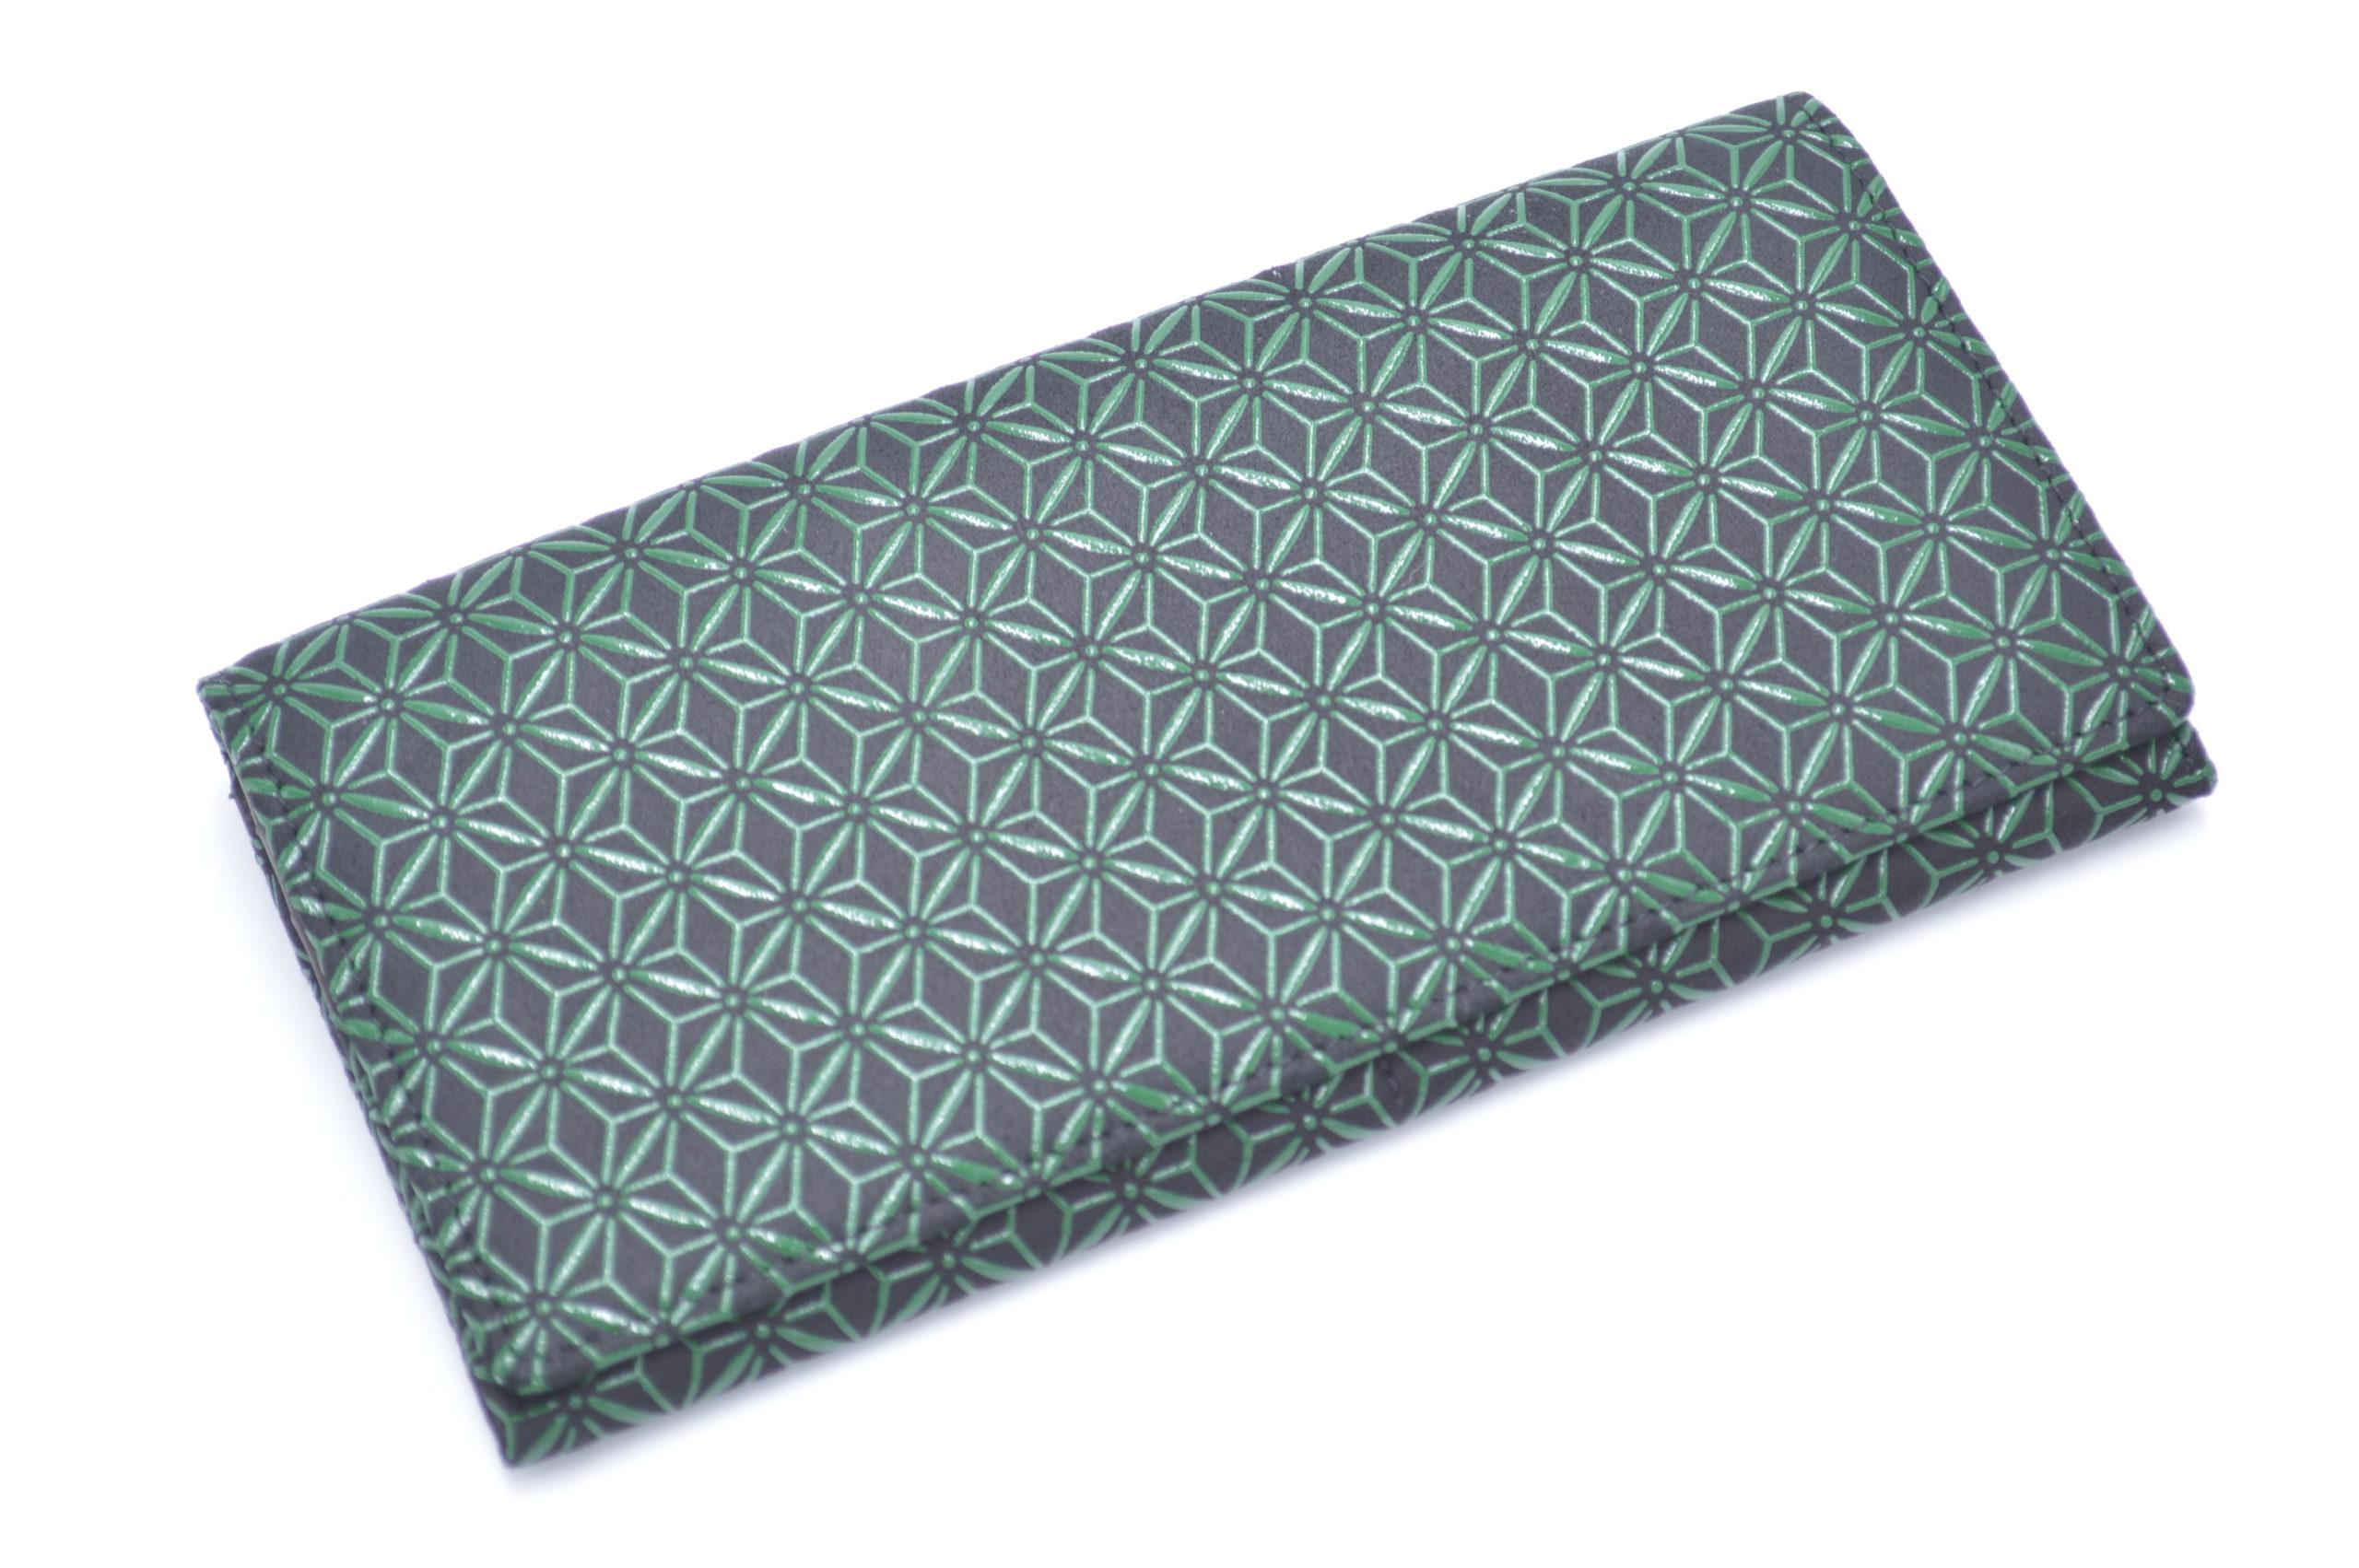 長財布E 黒/緑 麻の葉柄